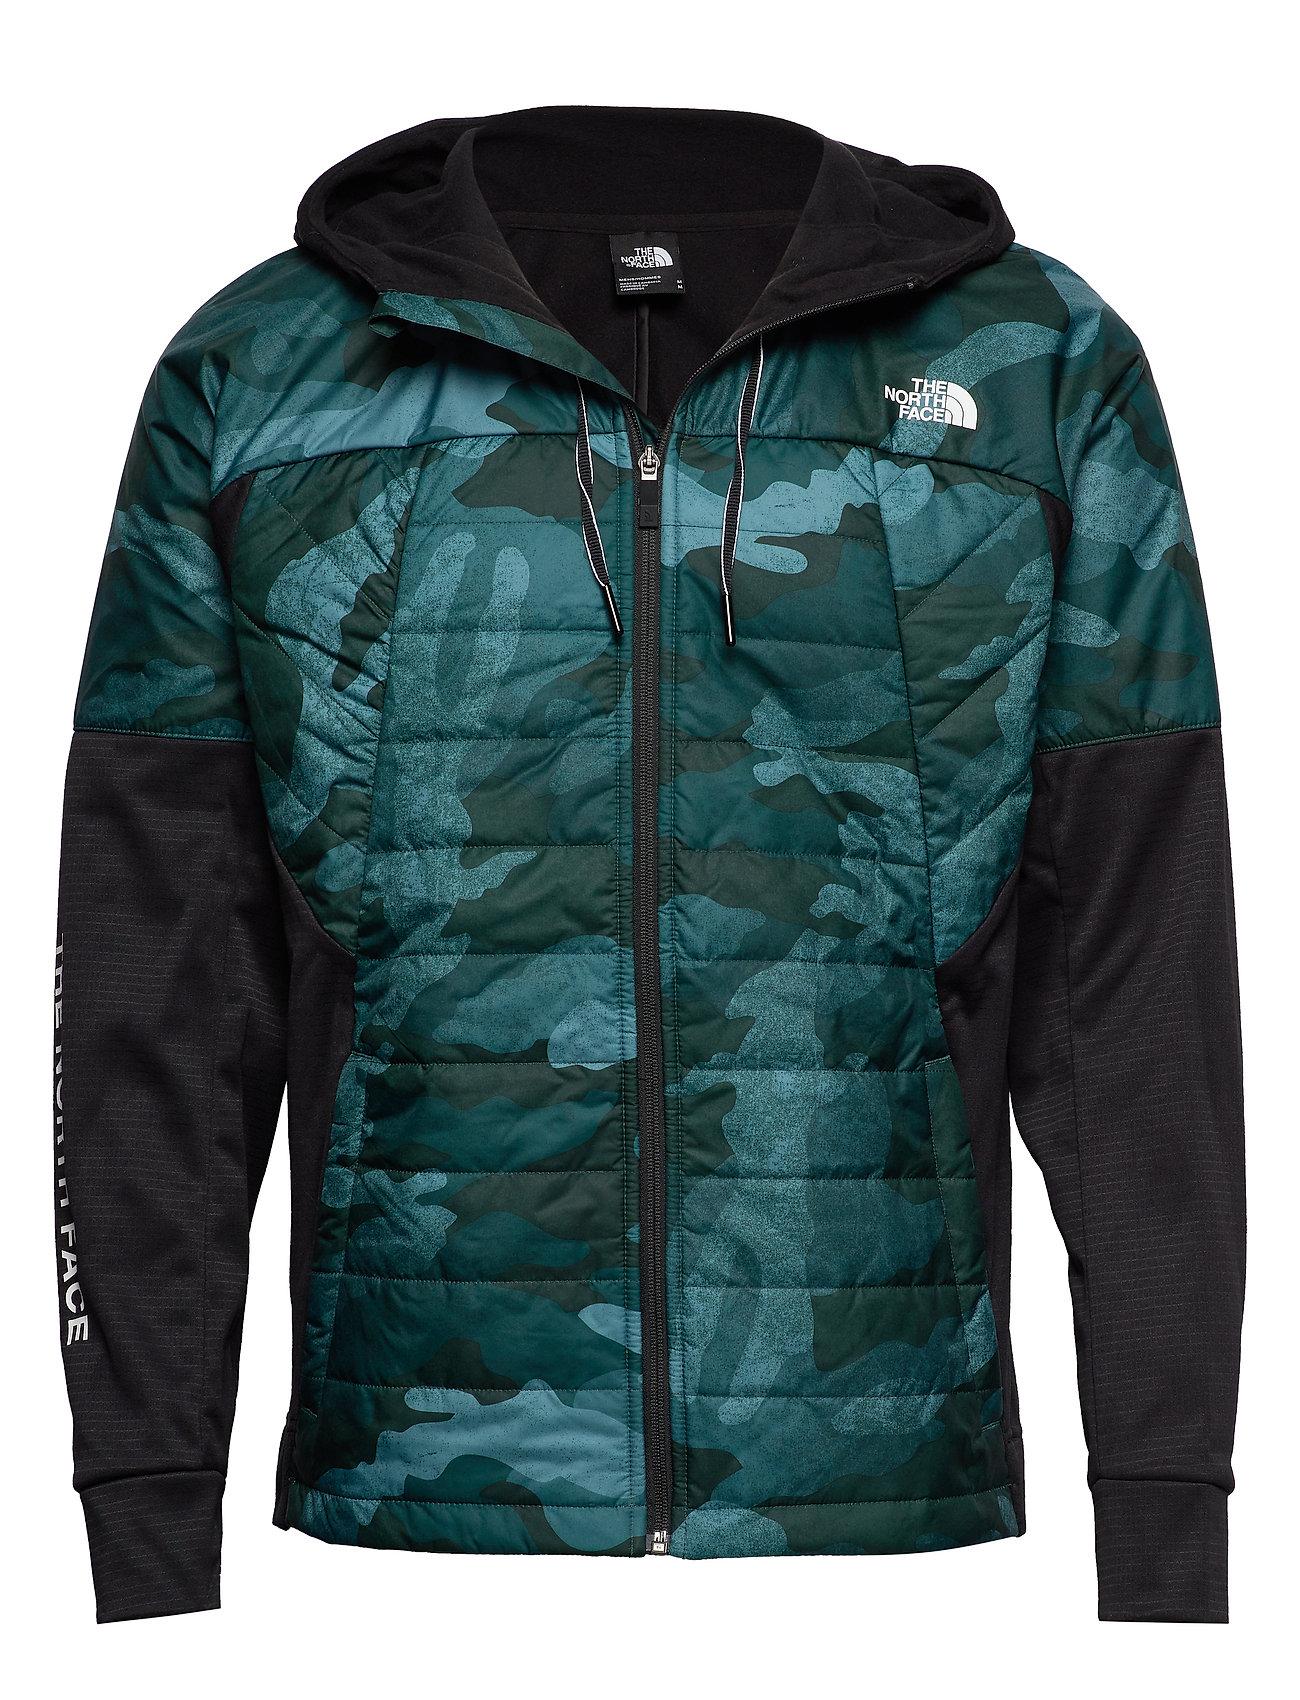 The North Face M TNL HYB INS JKT - BLACK/GREEN PRT